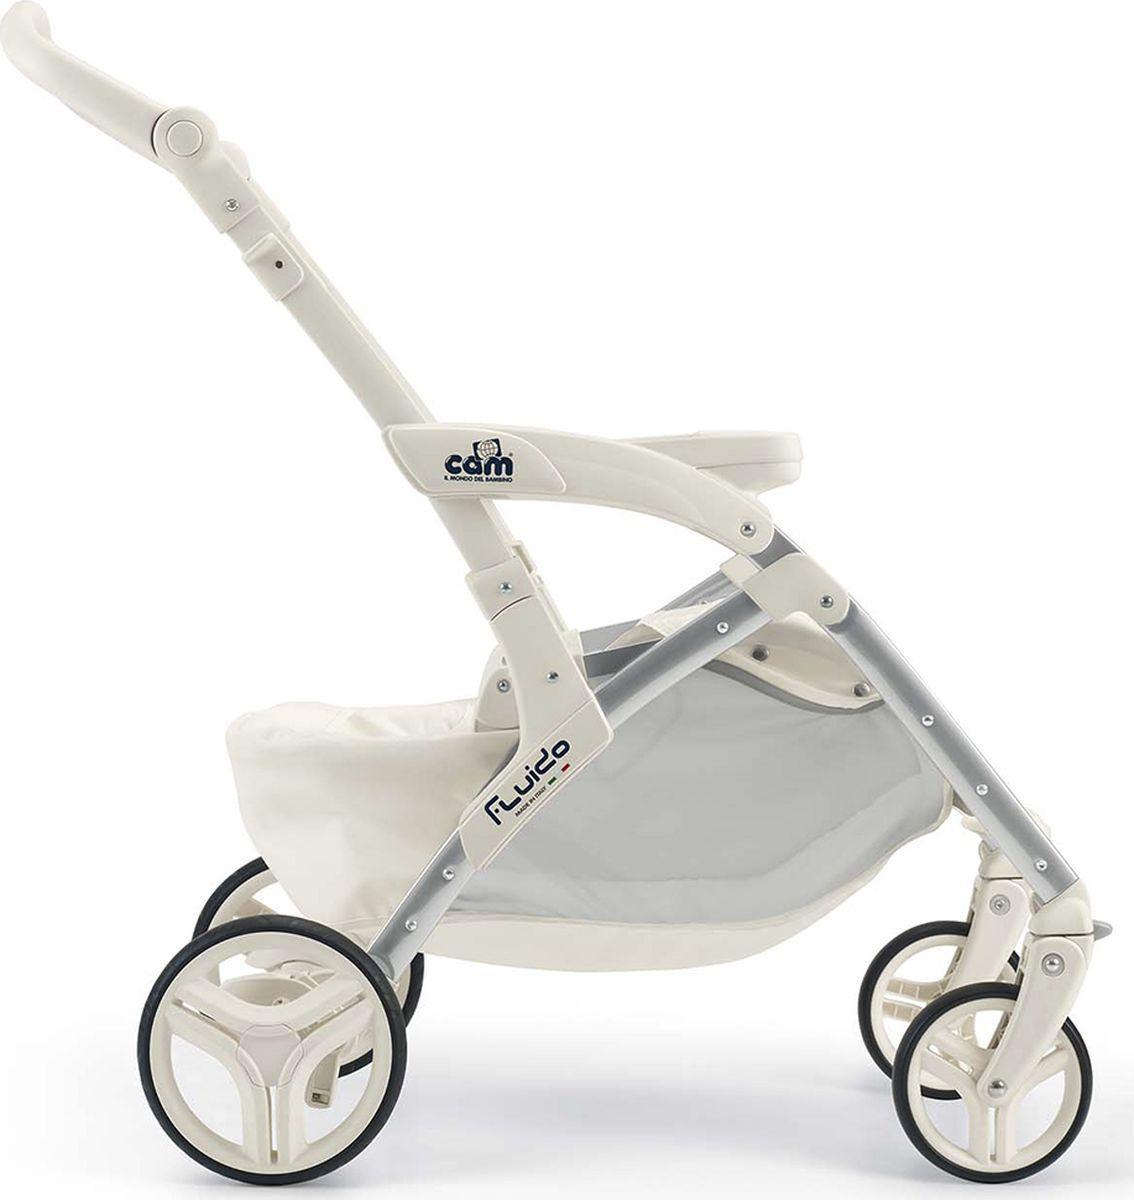 Шасси к коляске Cam Dinamico Up, 897T/V10, белый